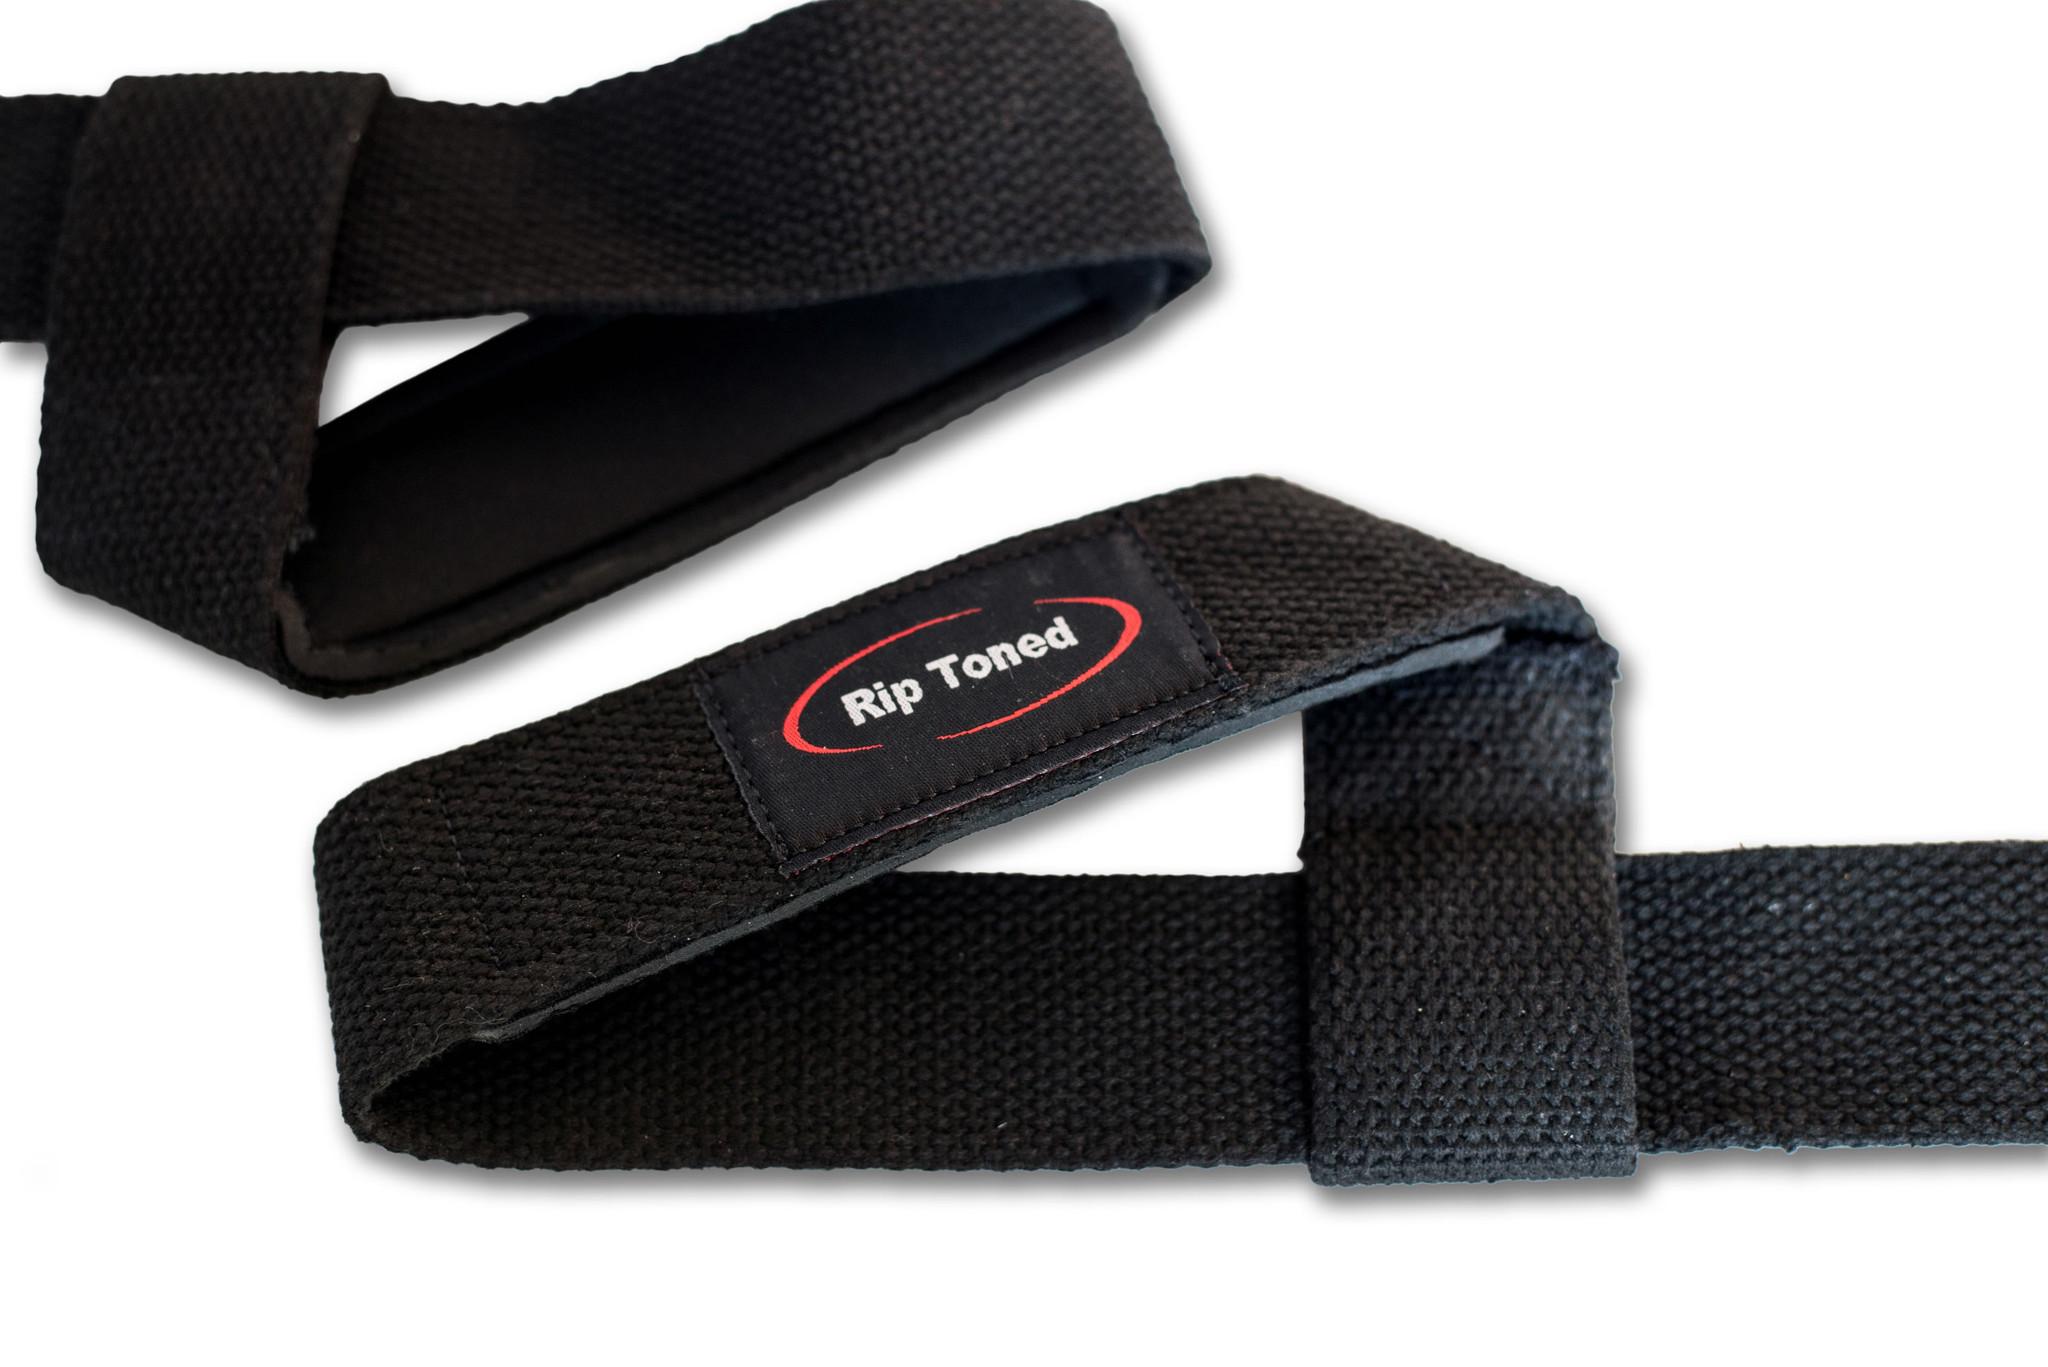 Rip Toned lifting straps